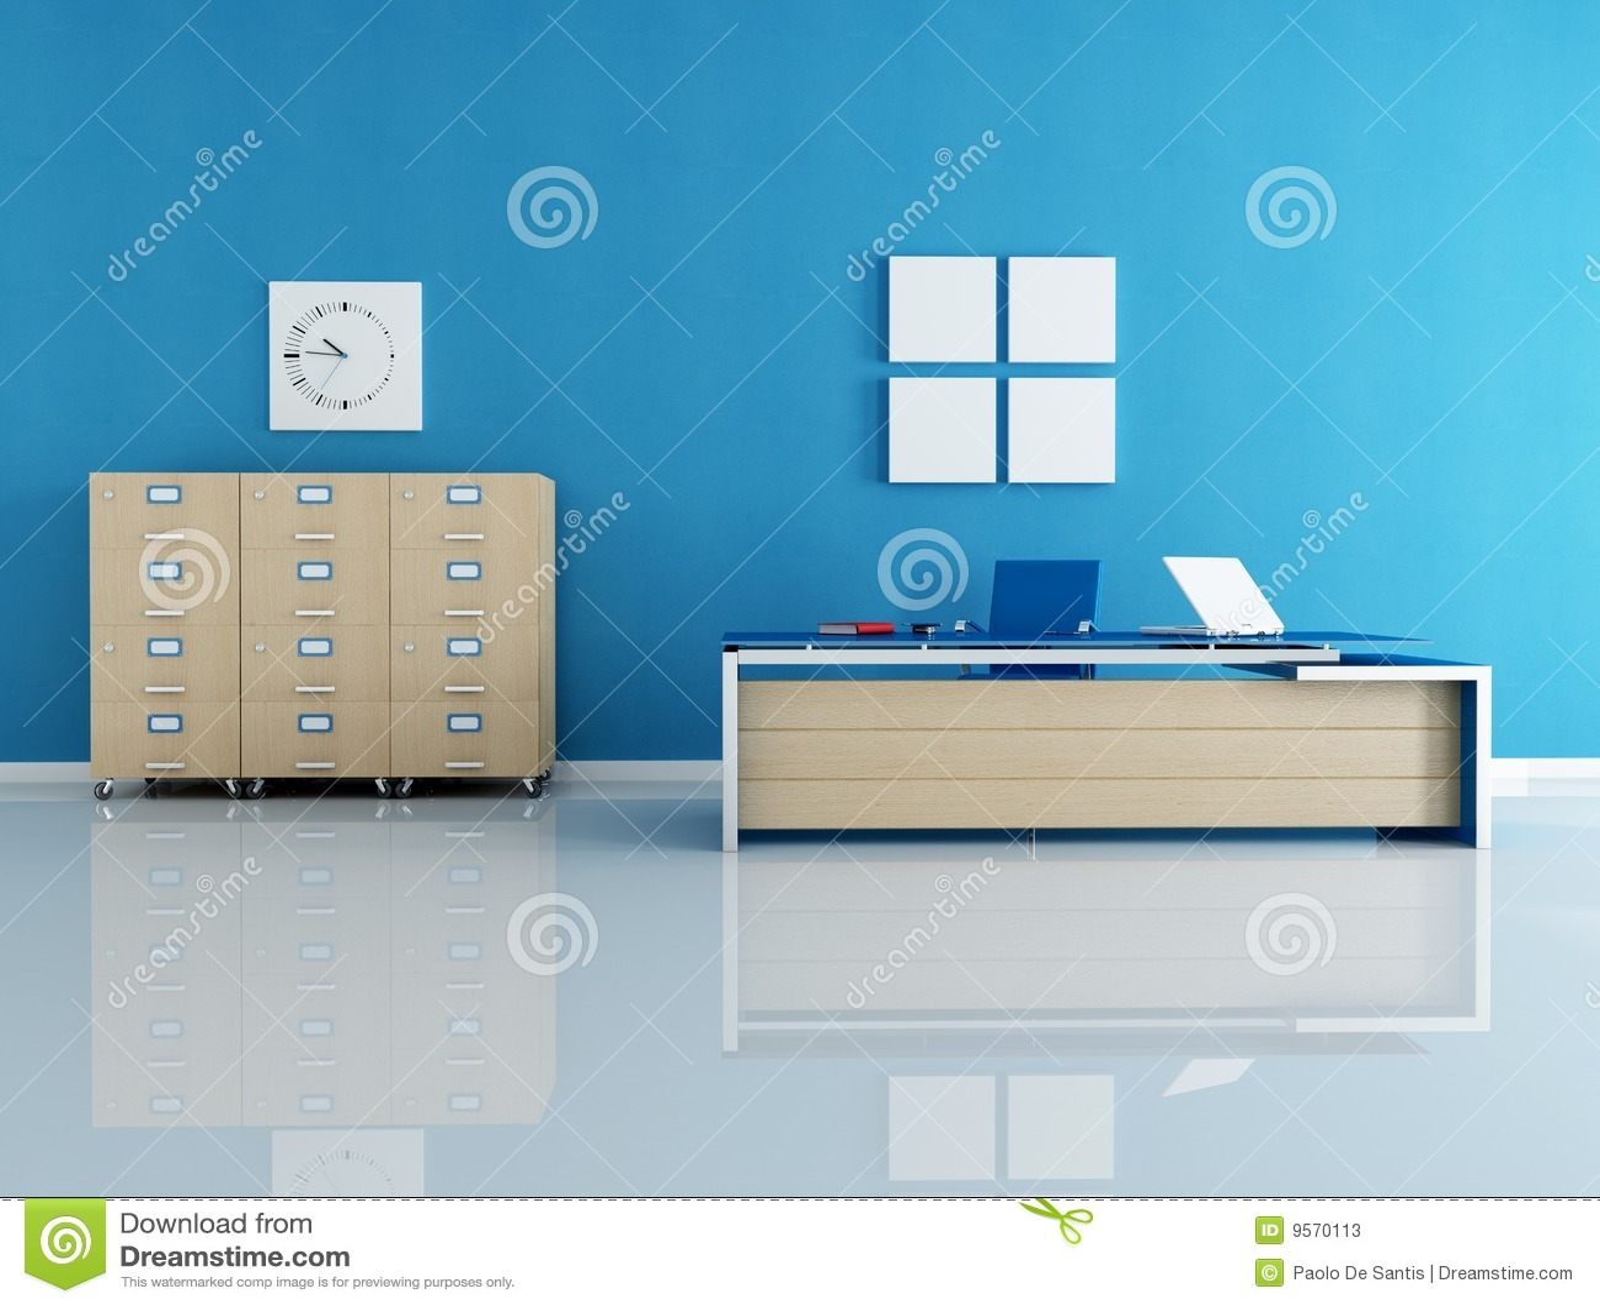 office chair illustration rowe keller blue interior stock illustration. image of contemporary - 9570113